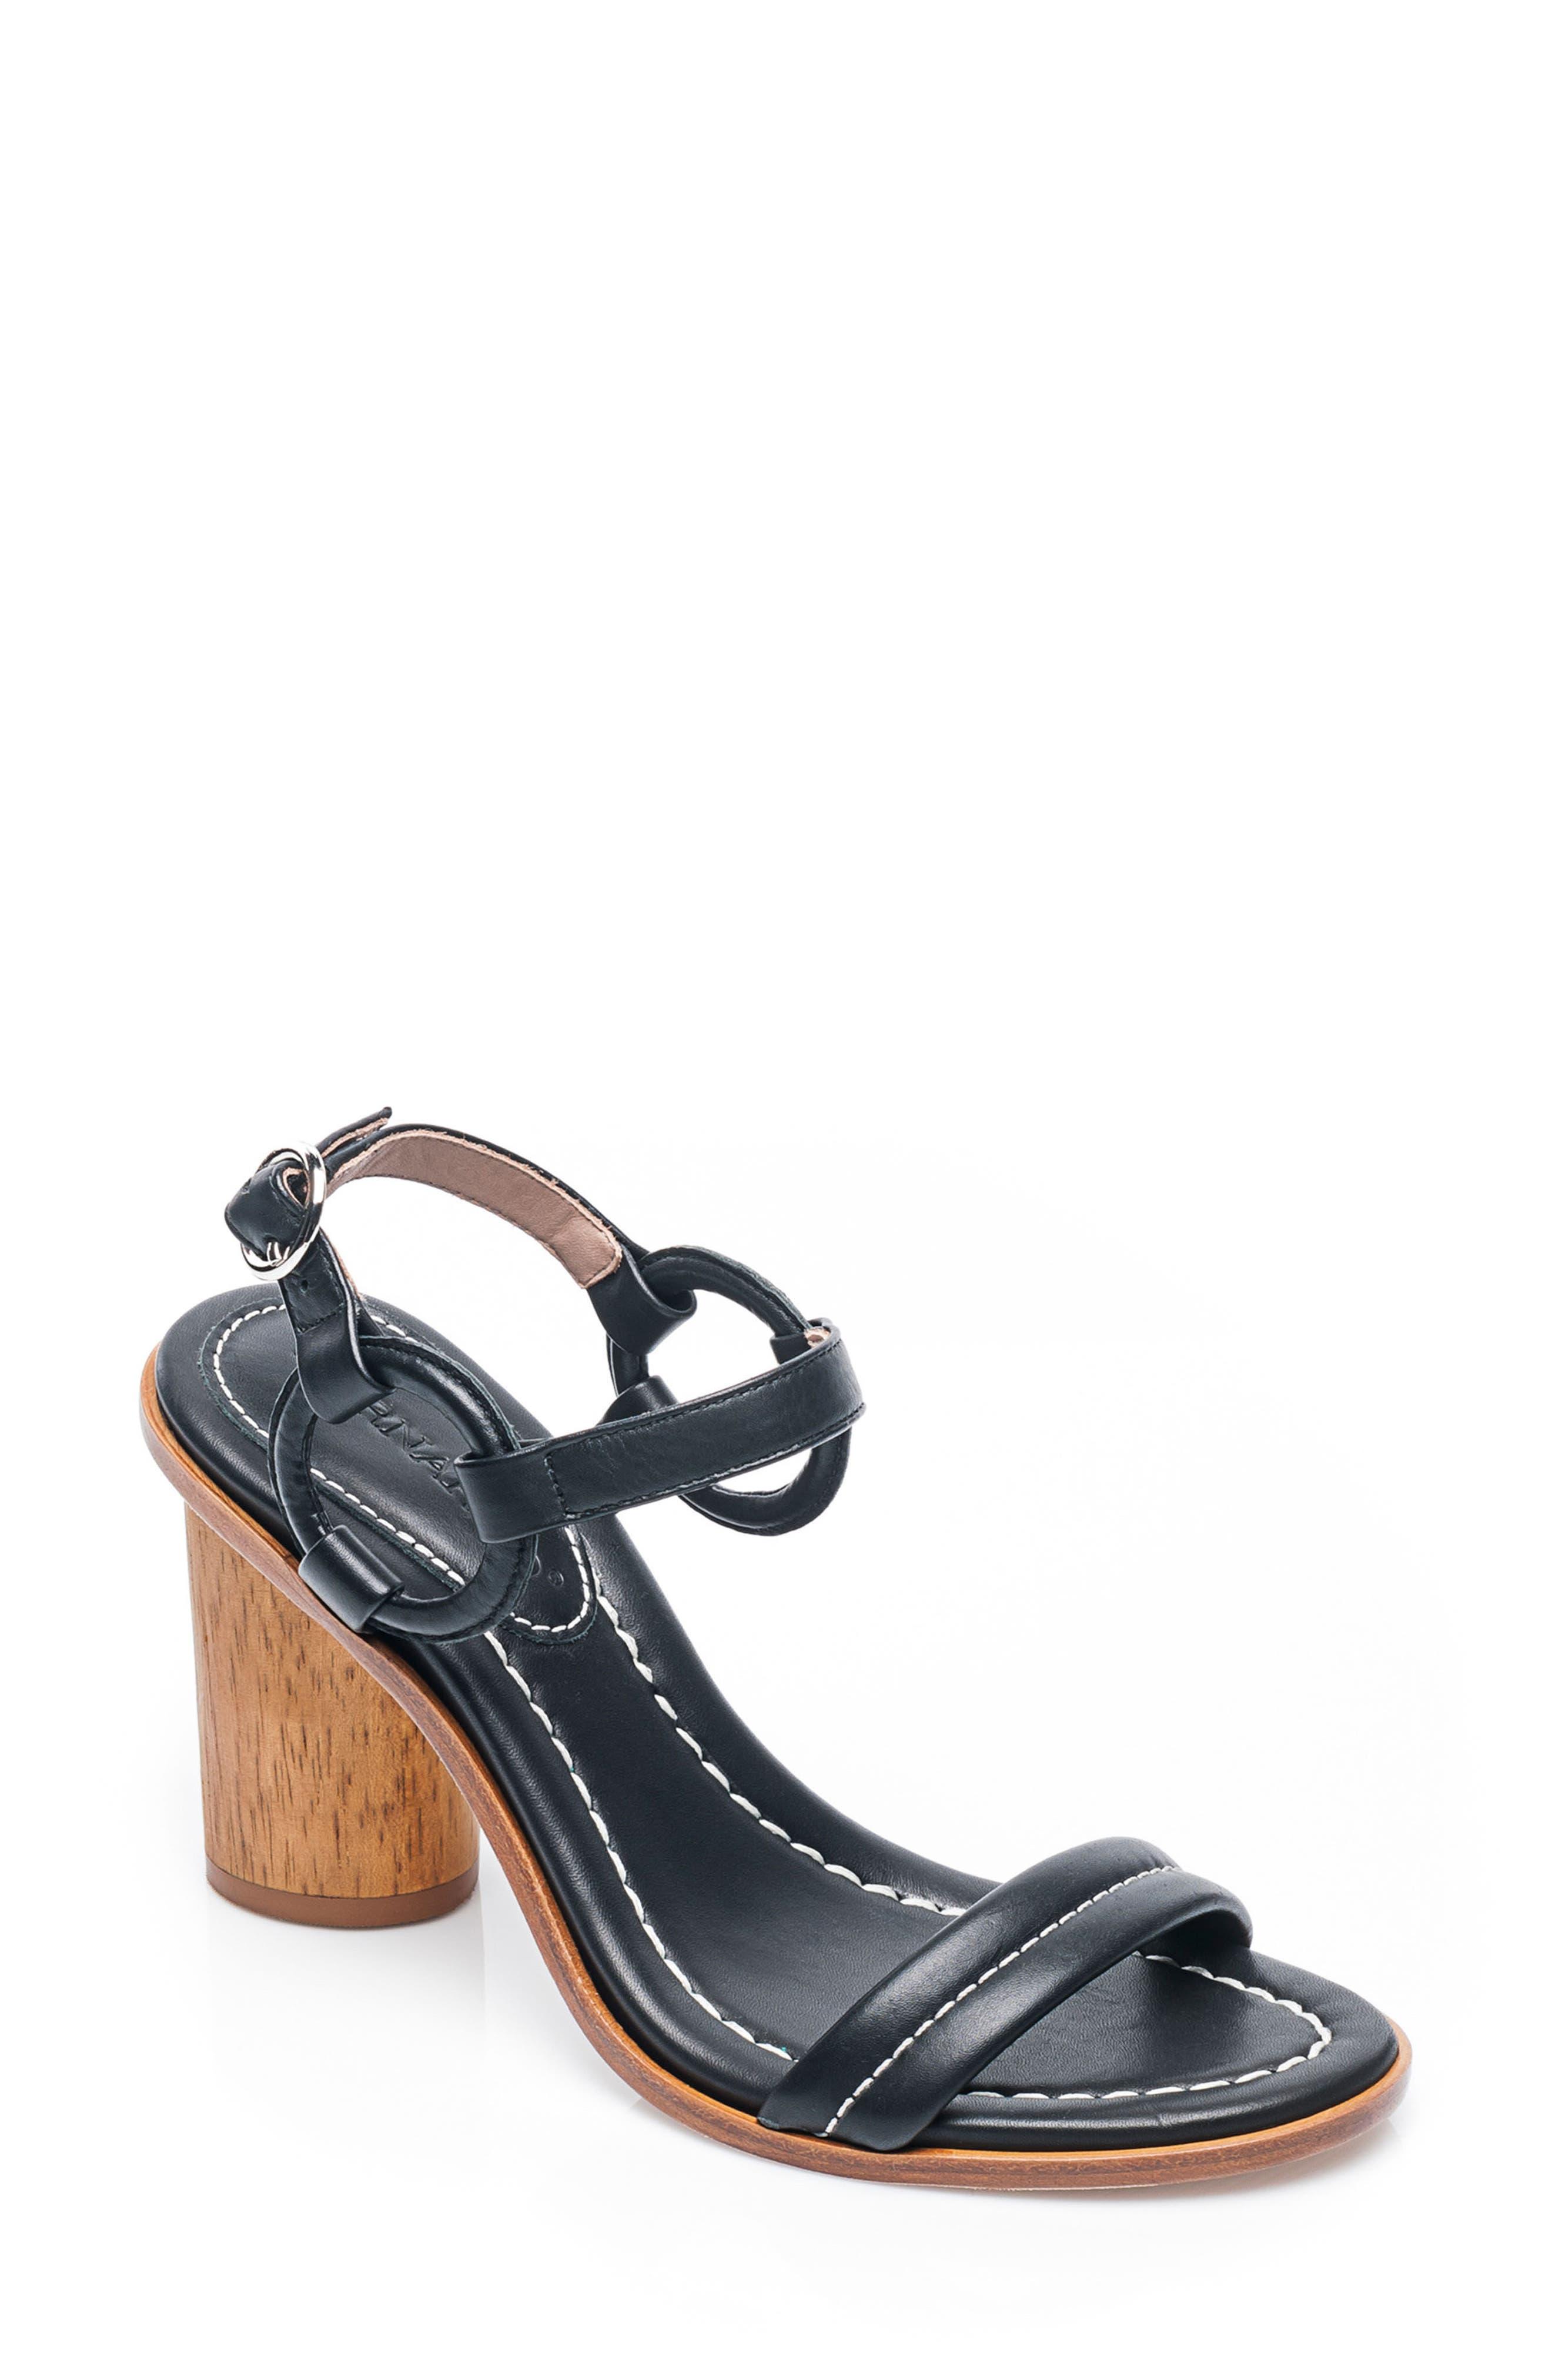 BERNARDO, Harlow Ankle Strap Sandal, Main thumbnail 1, color, BLACK LEATHER